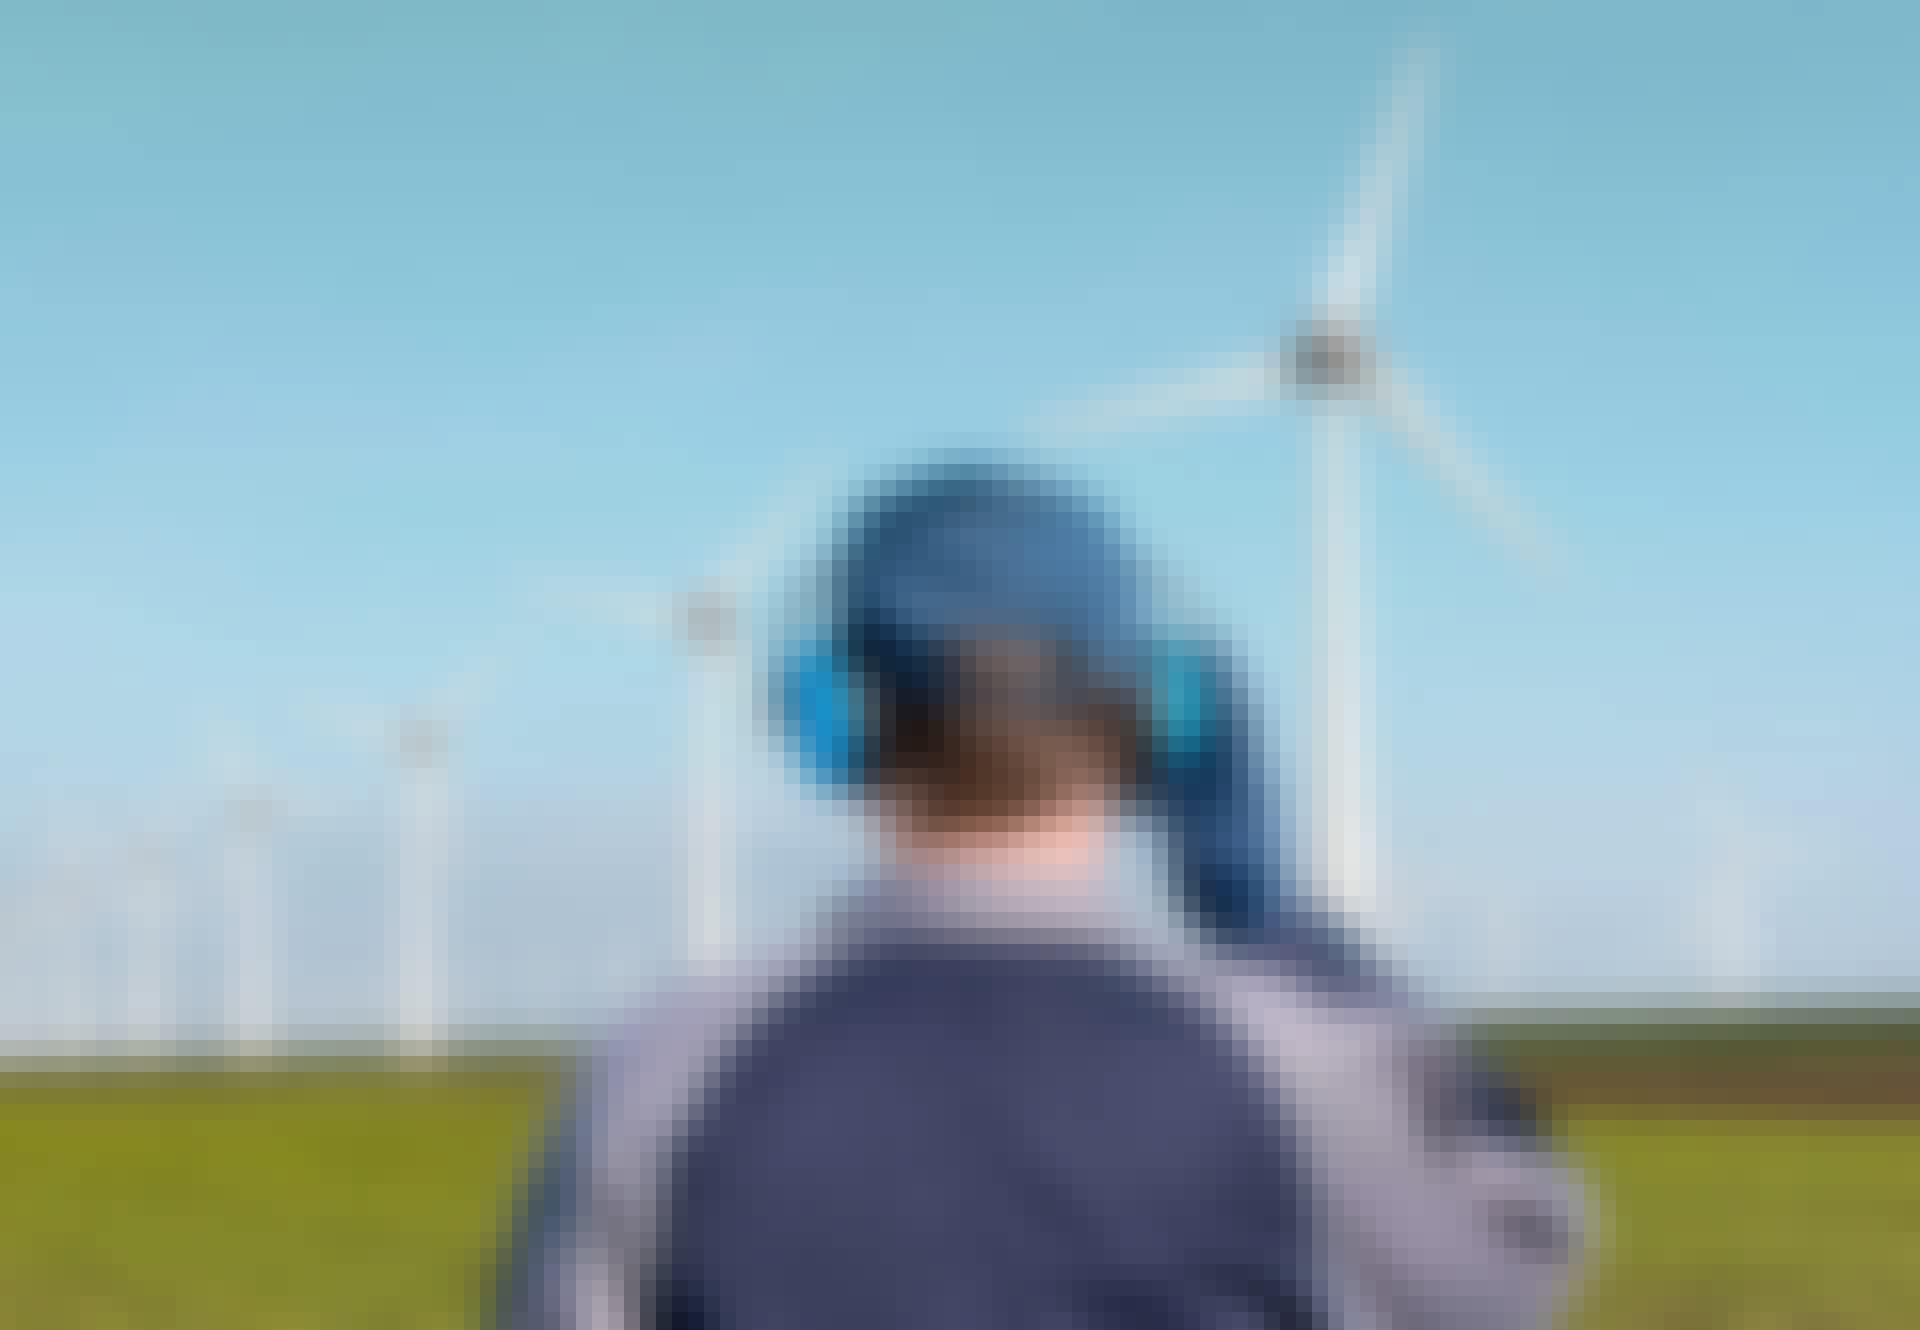 Vindkraftverk hörselskydd